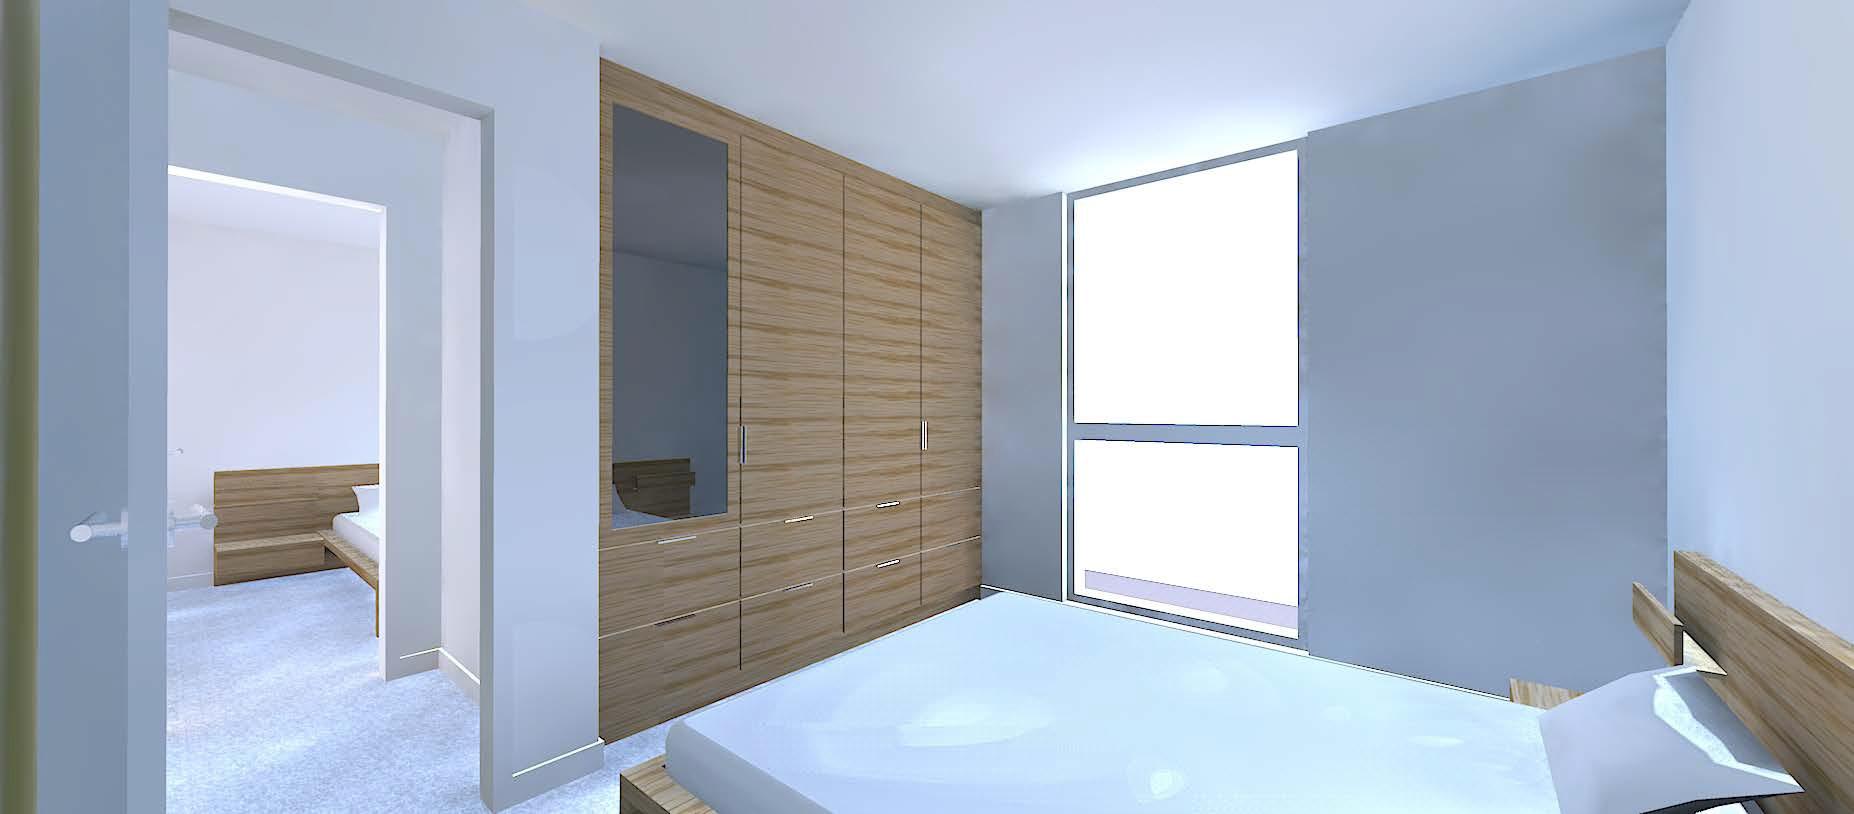 sec bed.jpg